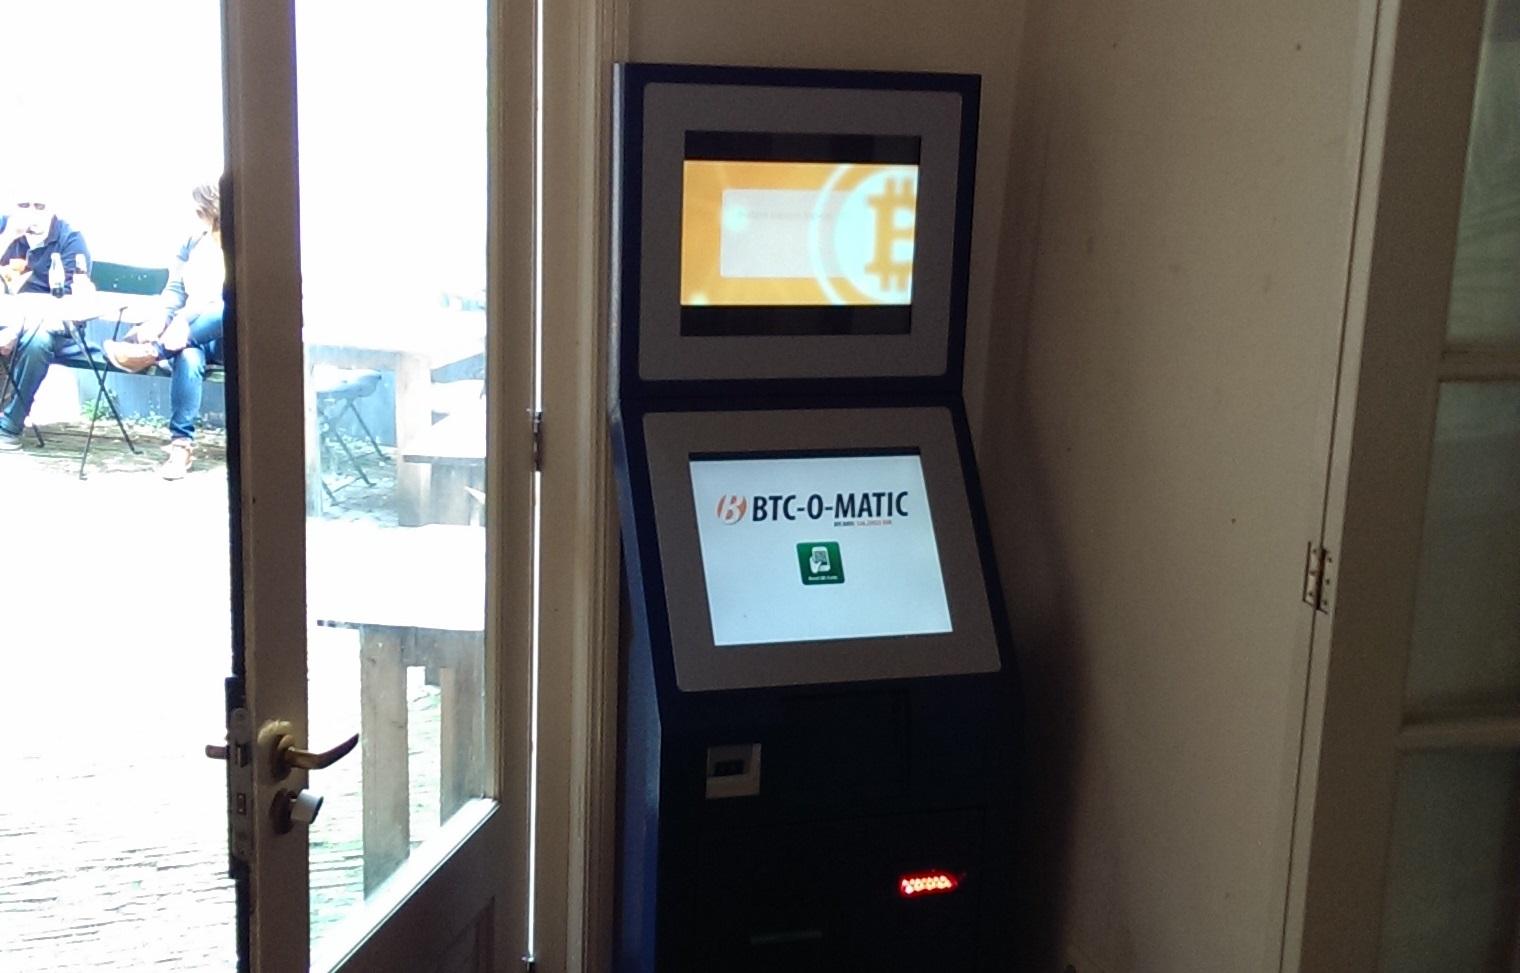 New BTC-O-MATIC vending machine arrives in Amsterdam